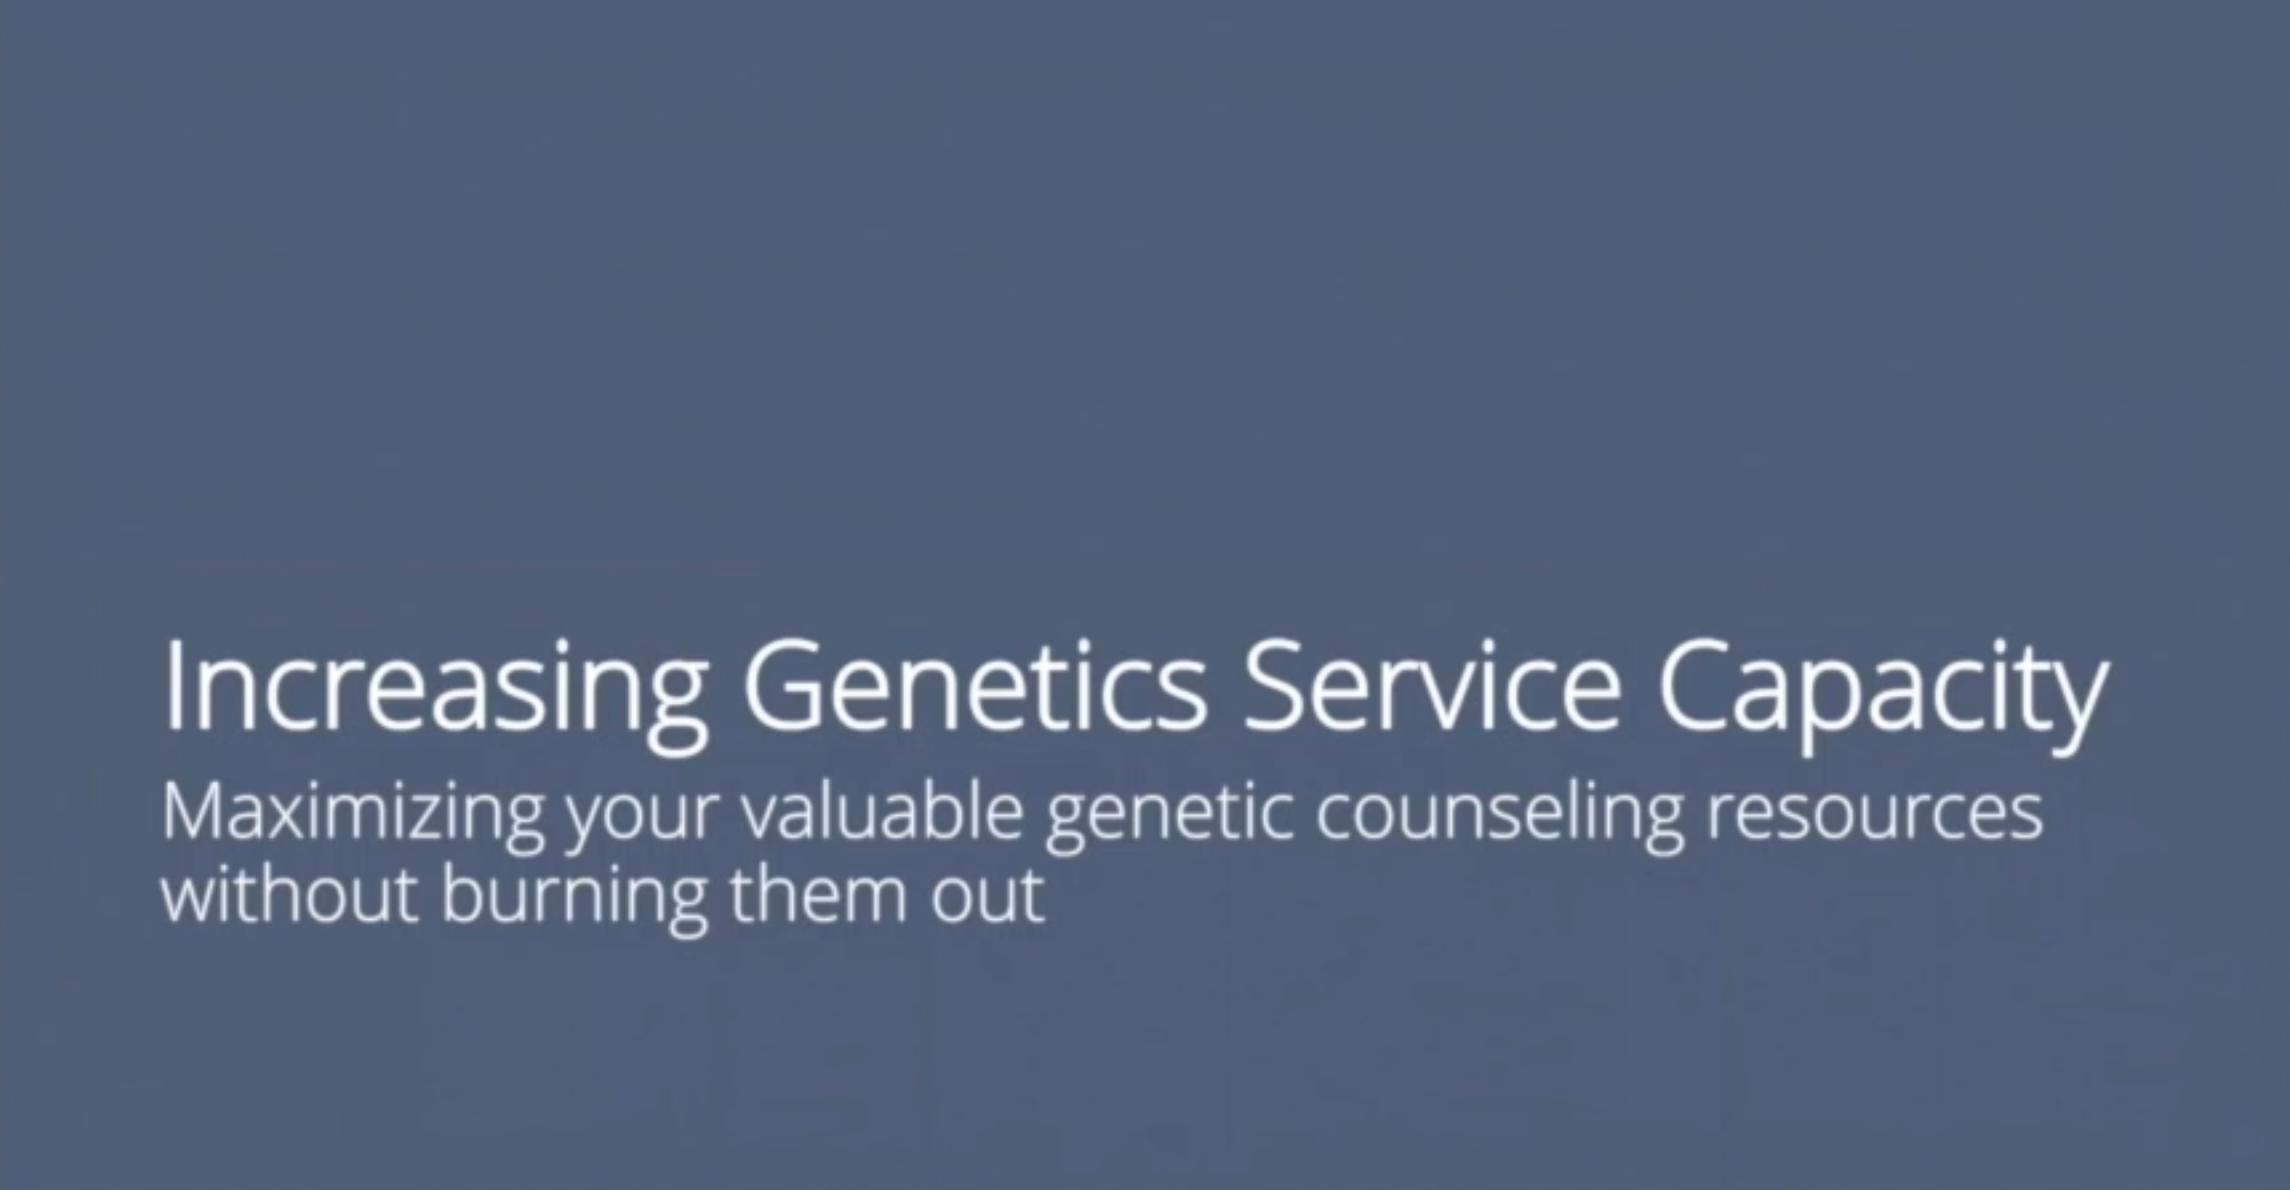 03_Increase genetics service capacity